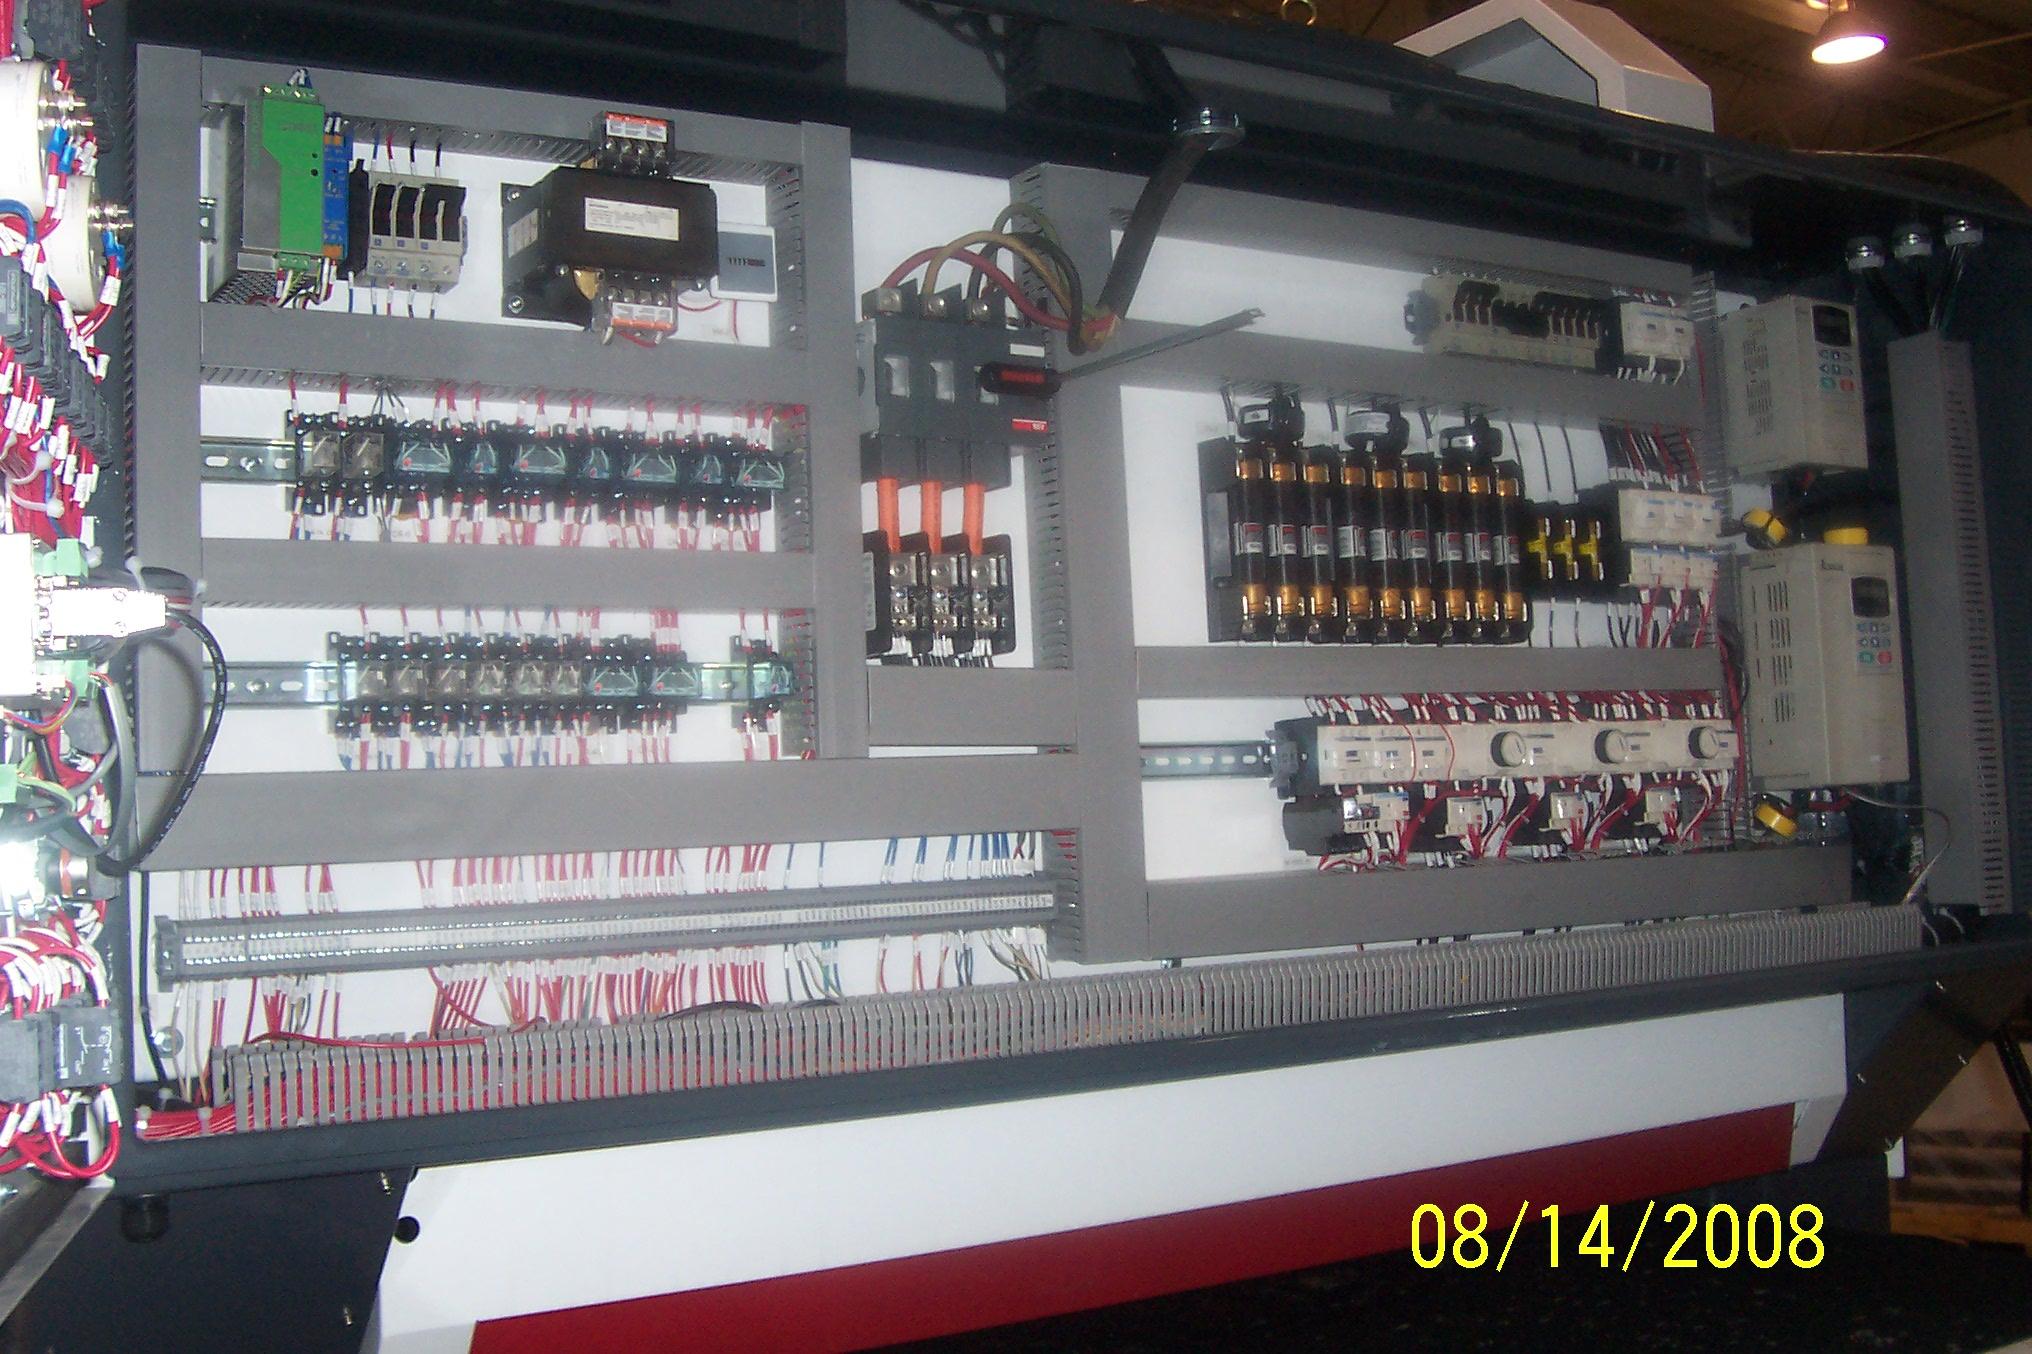 electrical_cabinet.jpg